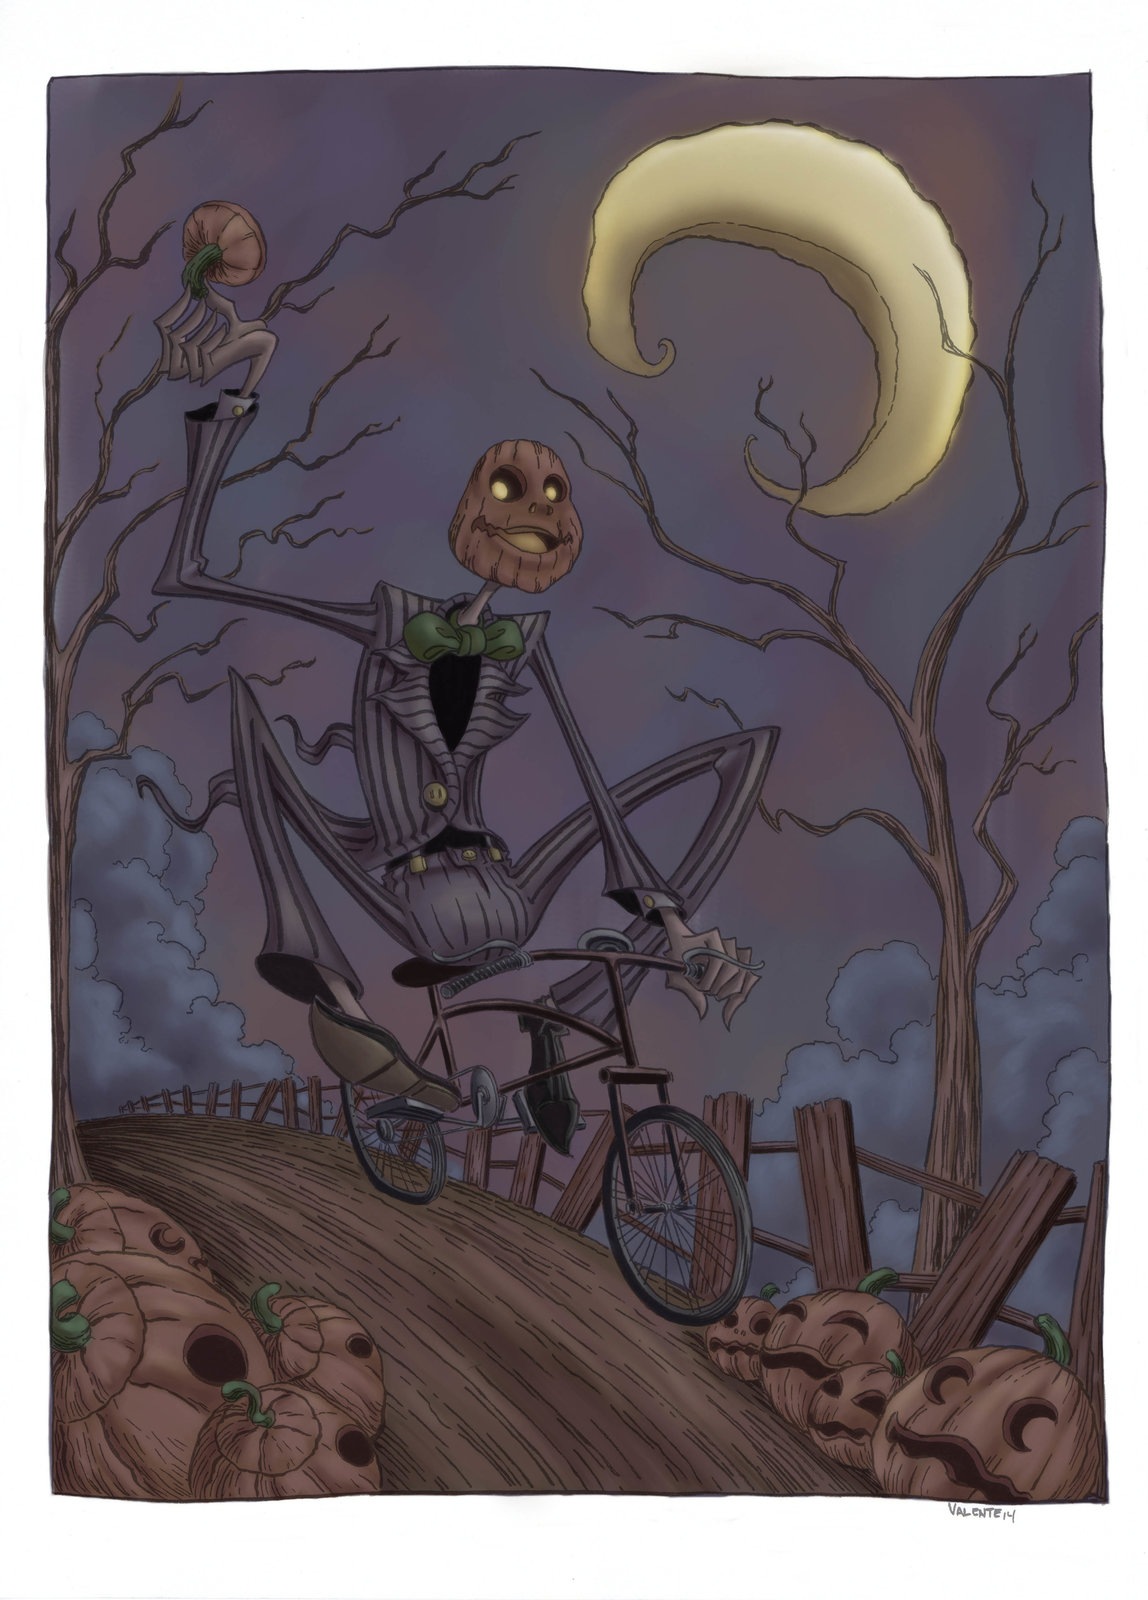 A Ride Through the Pumpkin Patch